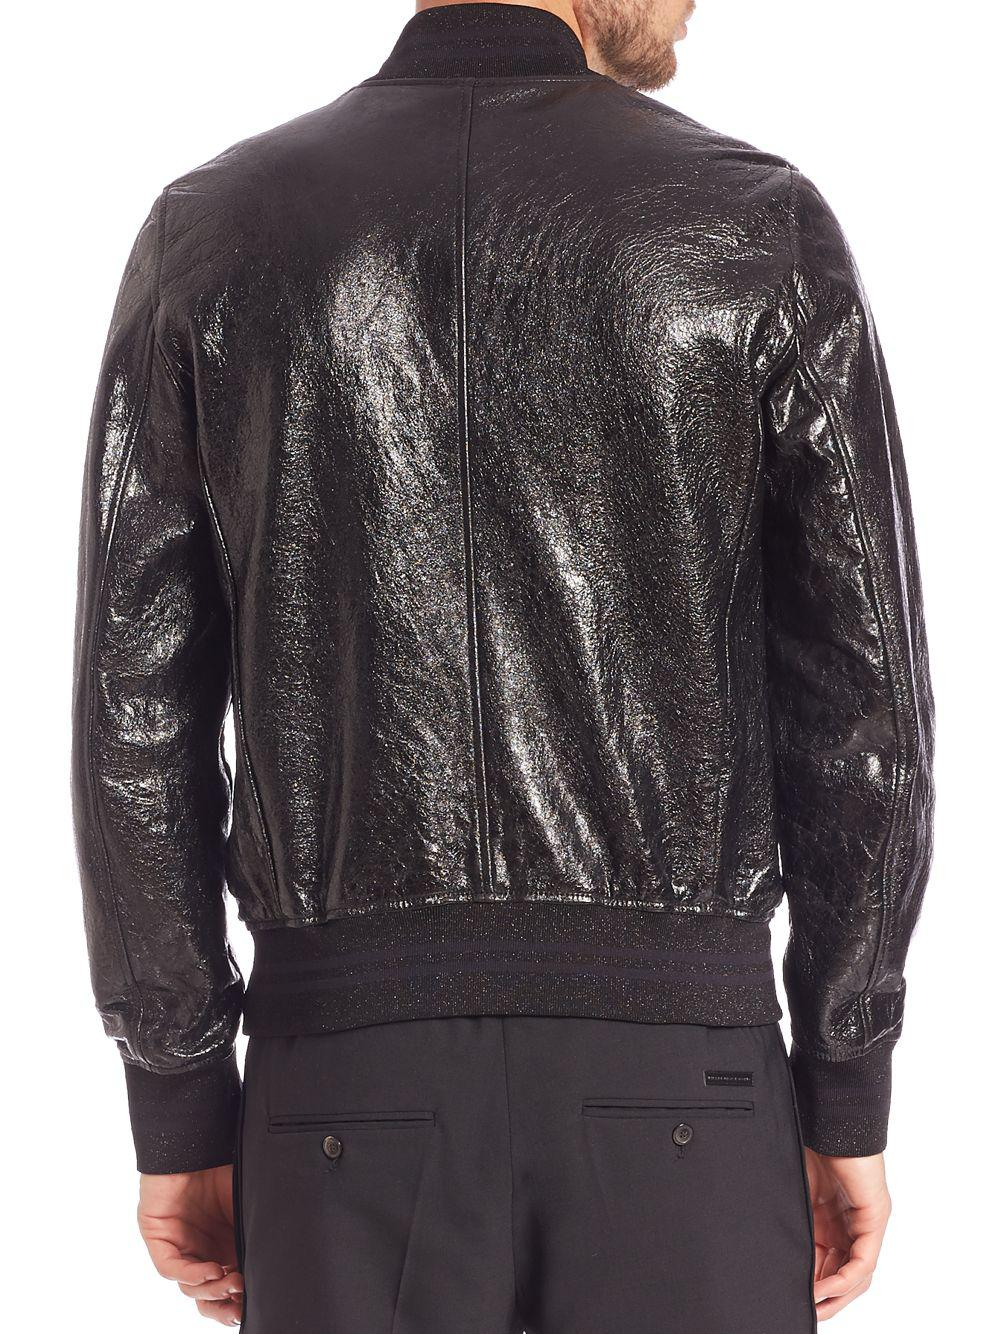 Lyst - Diesel Black Gold Larbirbo Cracked Lambskin Leather ...